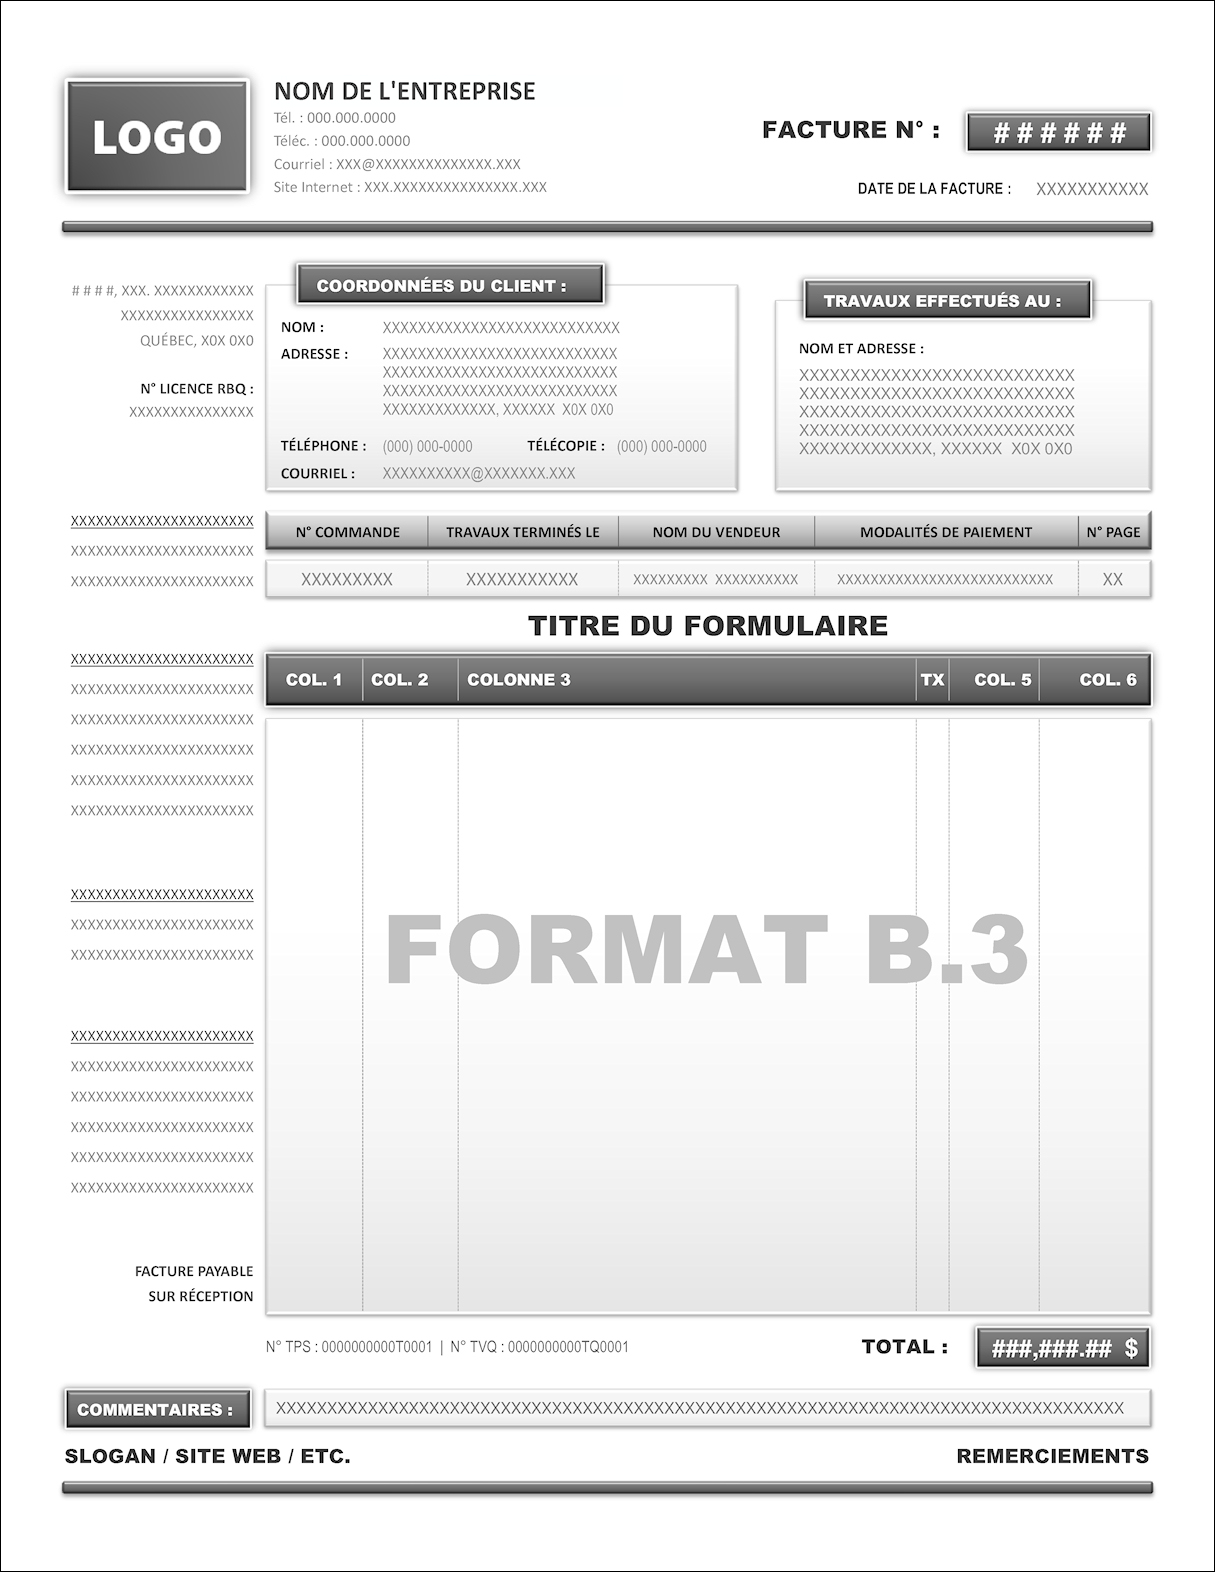 FORMAT B.3